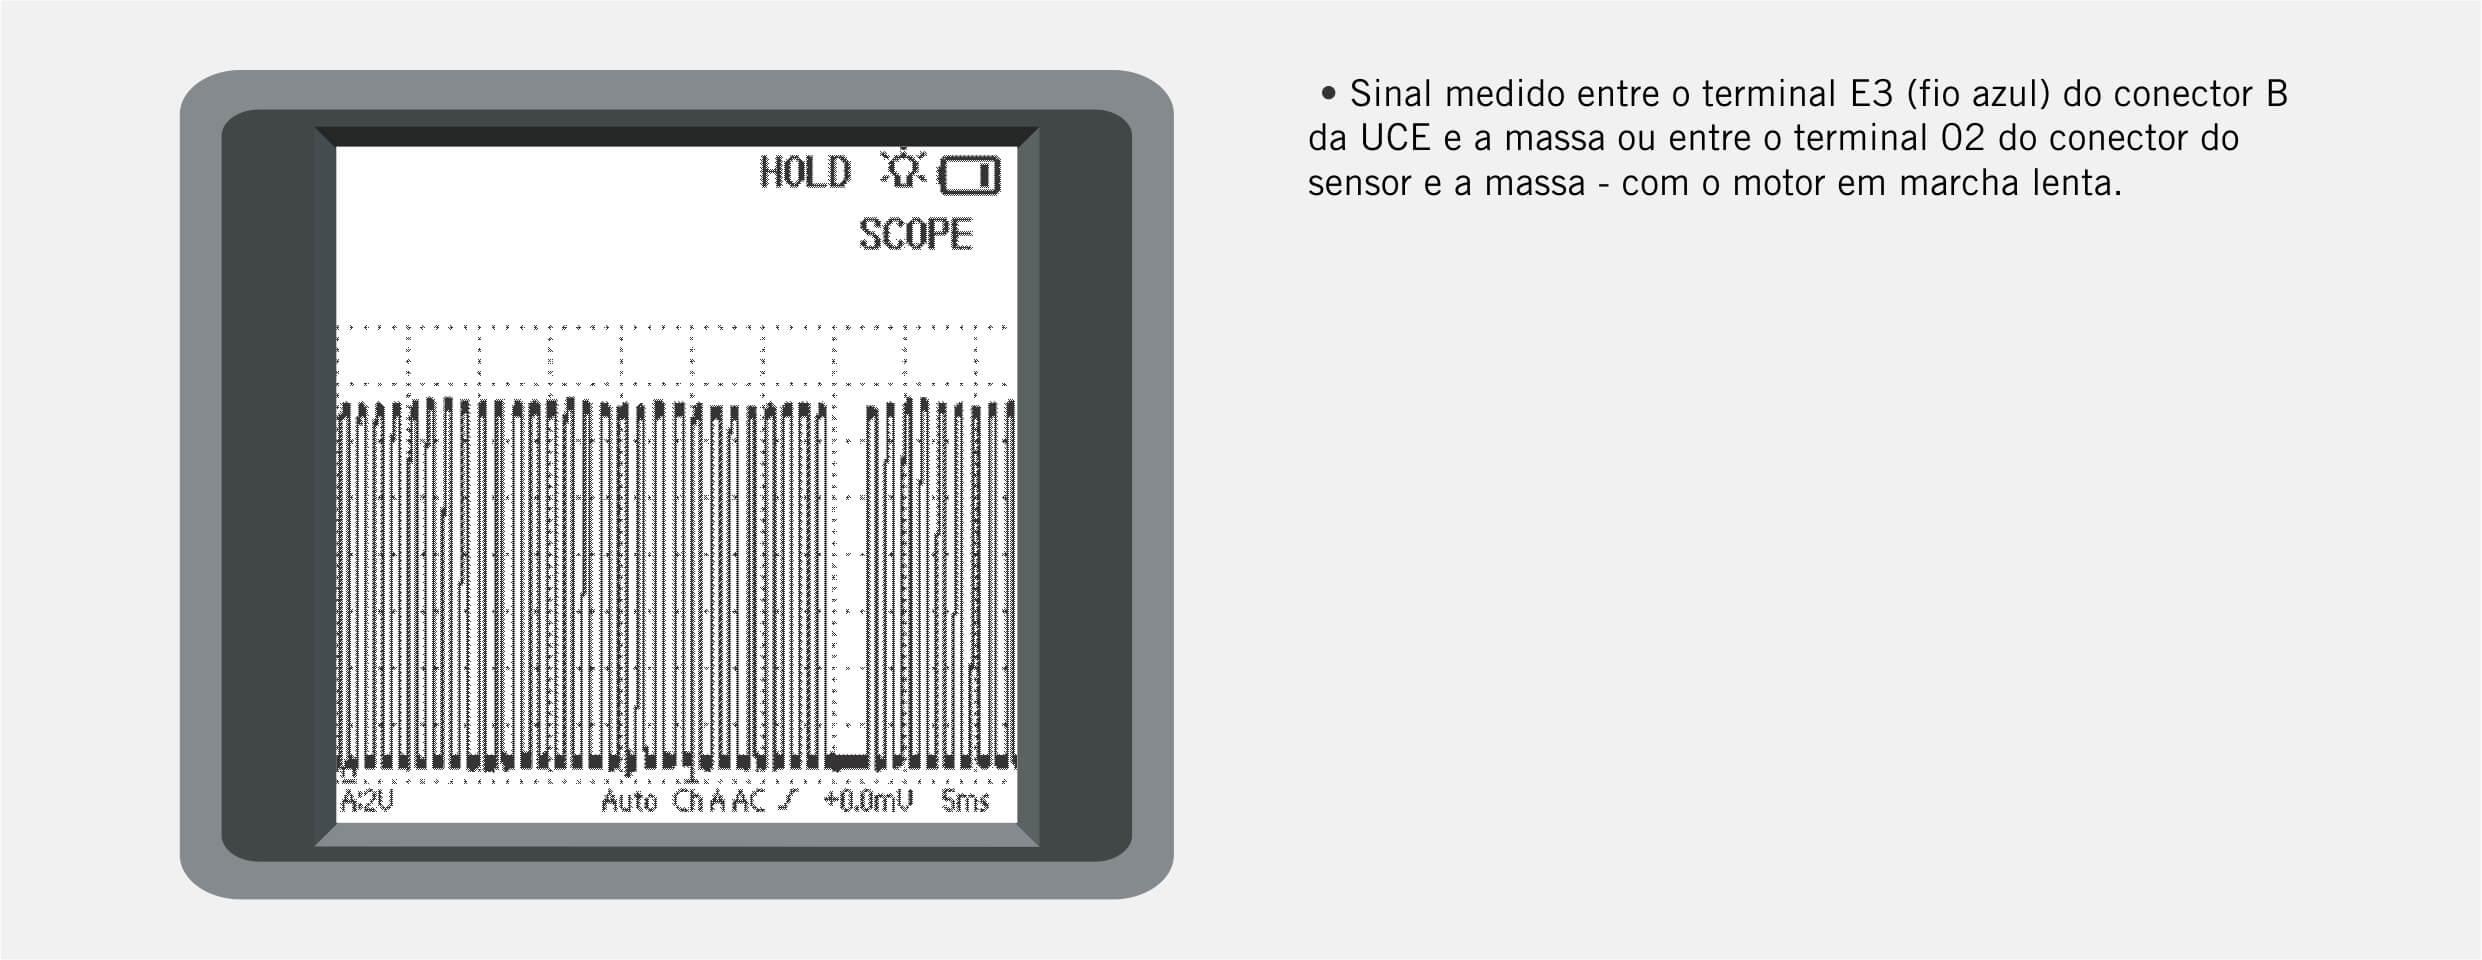 Gráfico do osciloscópio (oscilogramas) do sensor Hall para o veículo Ford Ranger 3.0 NGD.